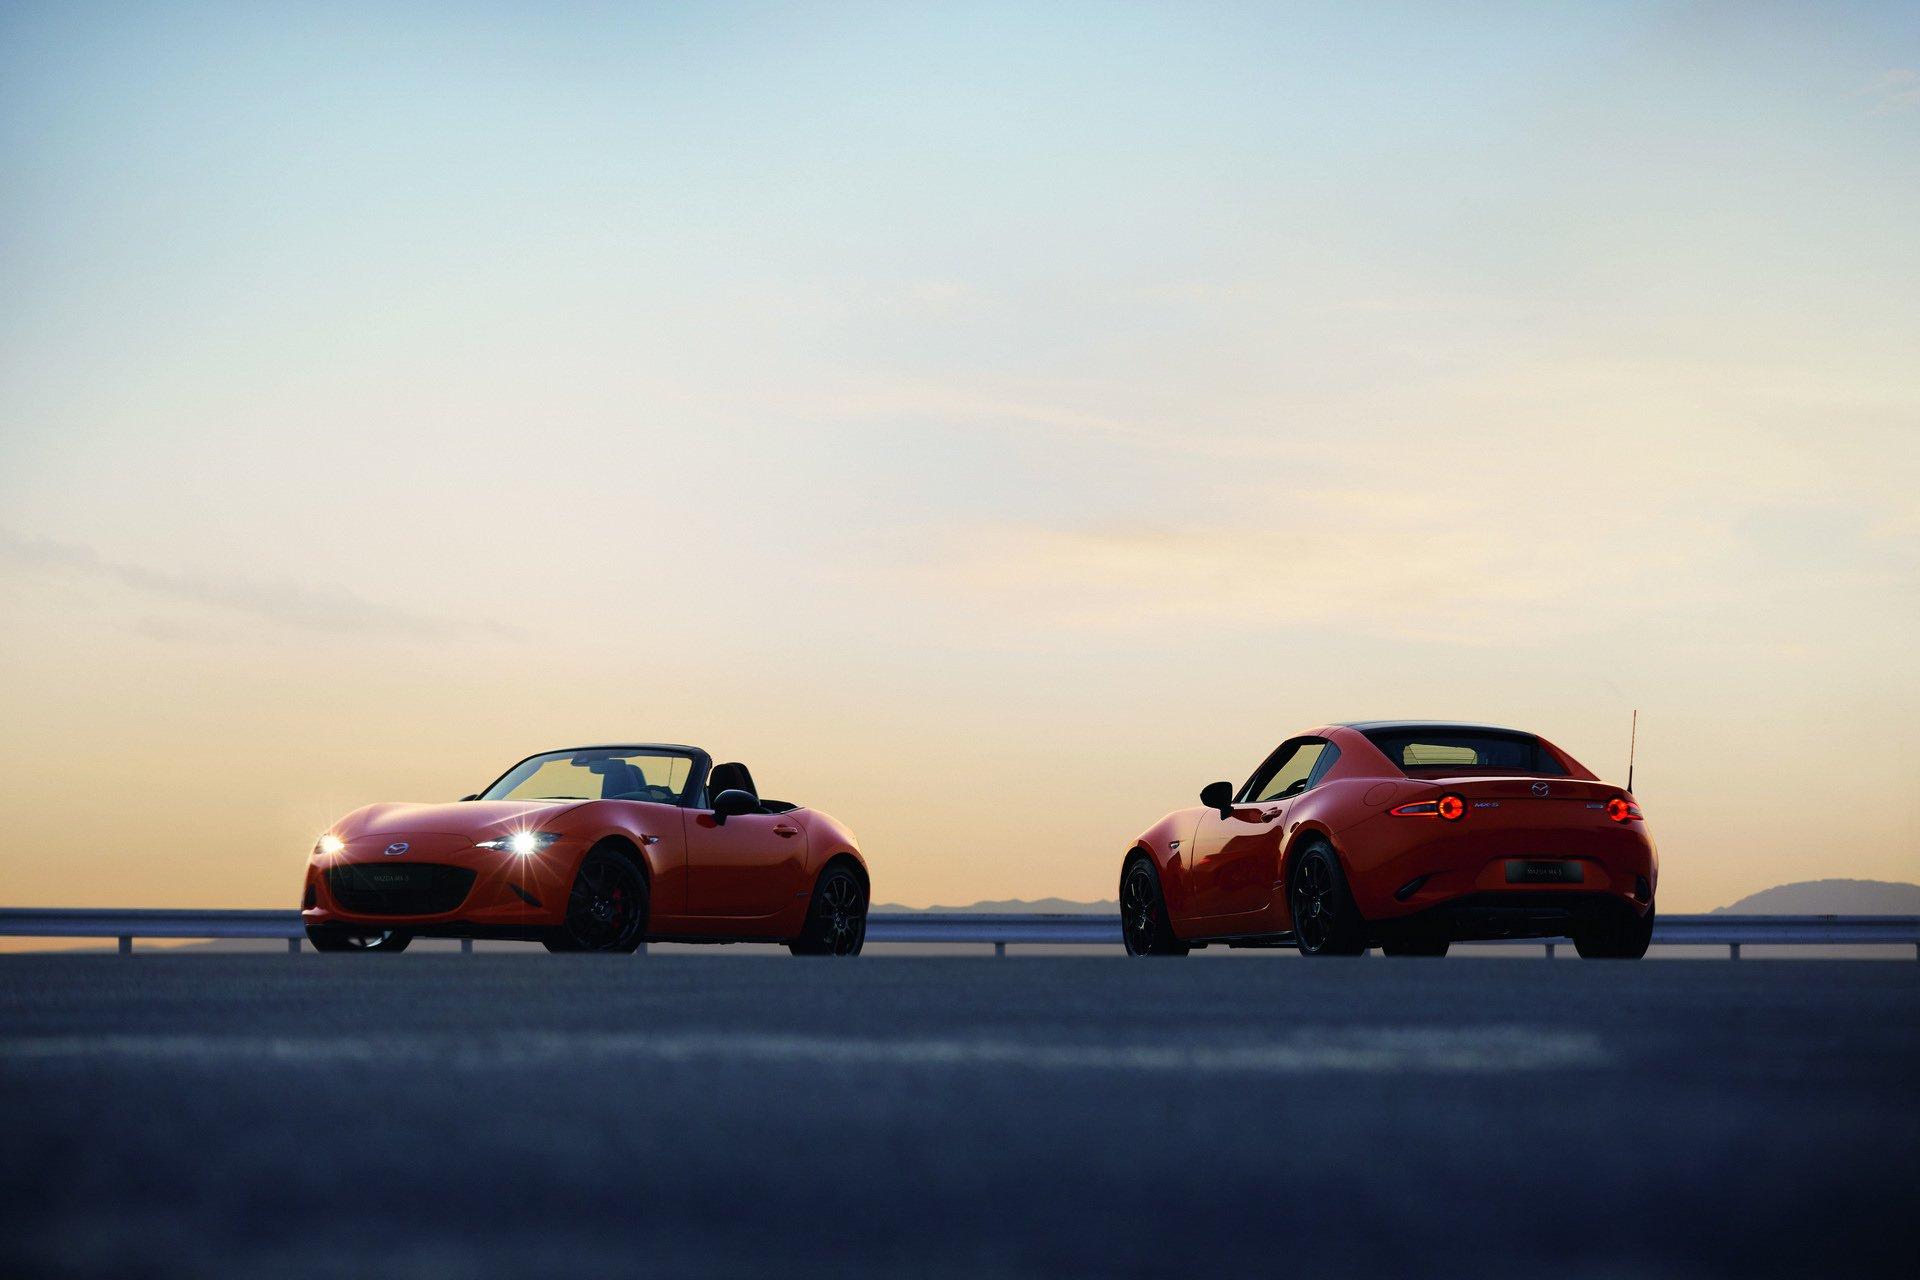 Noua Mazda MX-5 30th Anniversary Edition - Informații și fotografii oficiale (8)